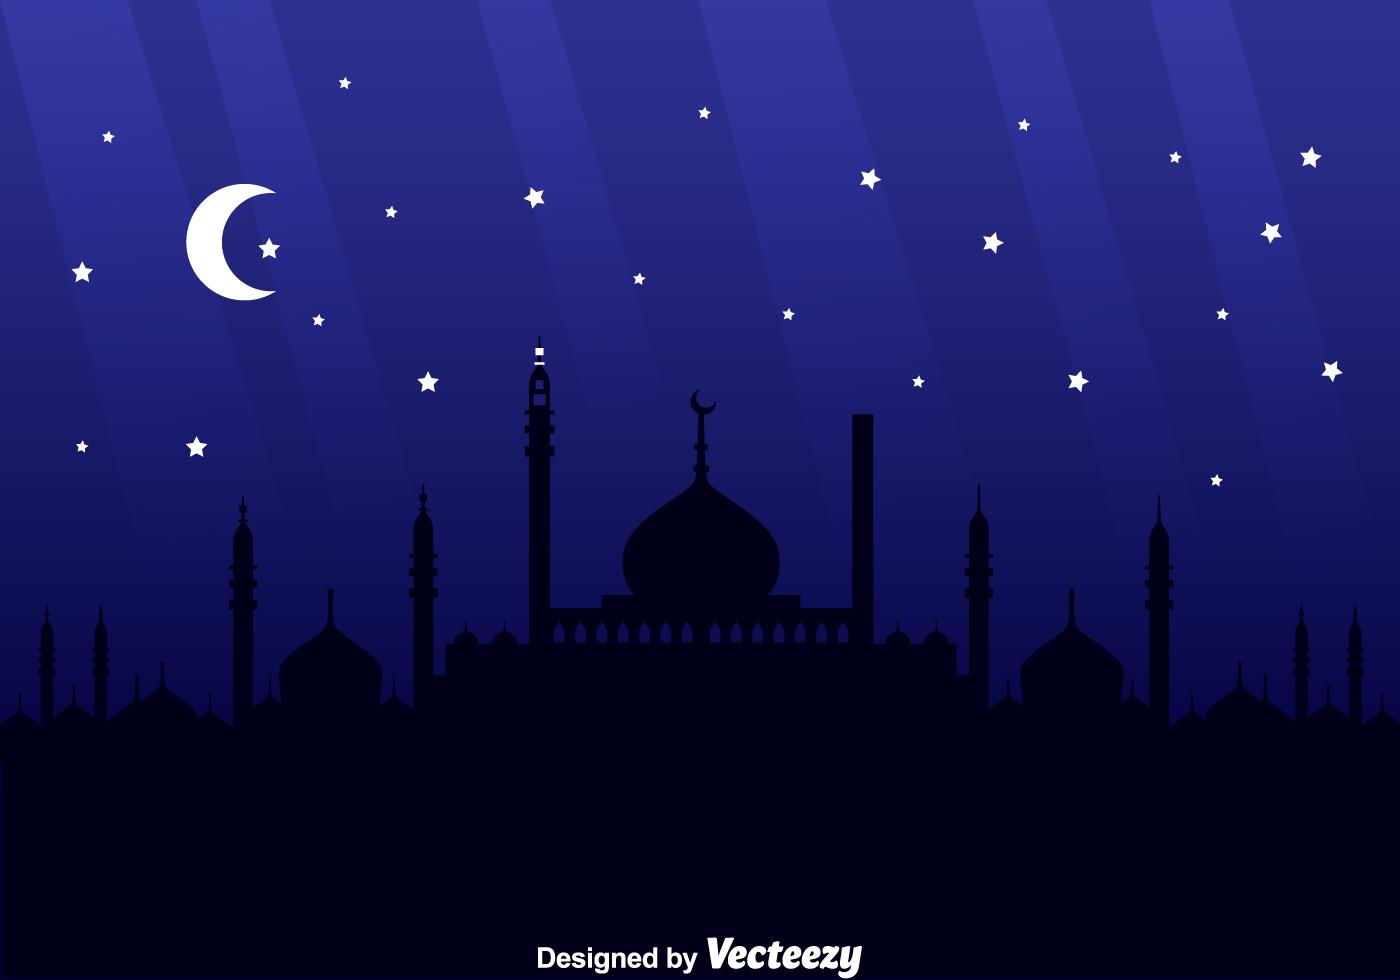 Arabian Night Background - Download Free Vector Art, Stock ...